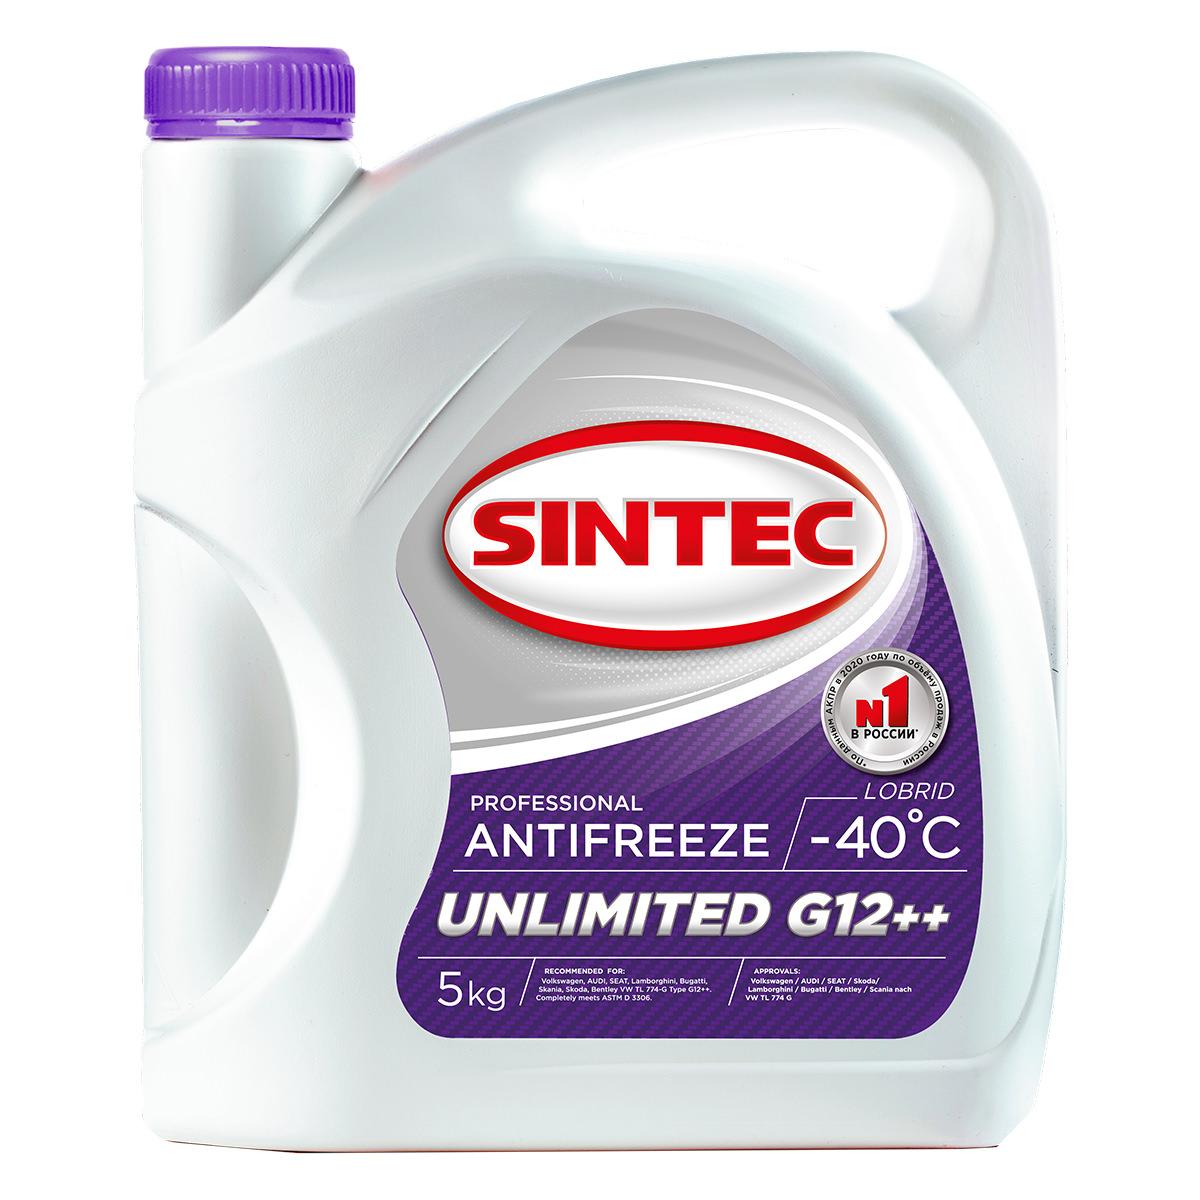 SINTEC ANTIFREEZE UNLIMITED G12++ (-40)